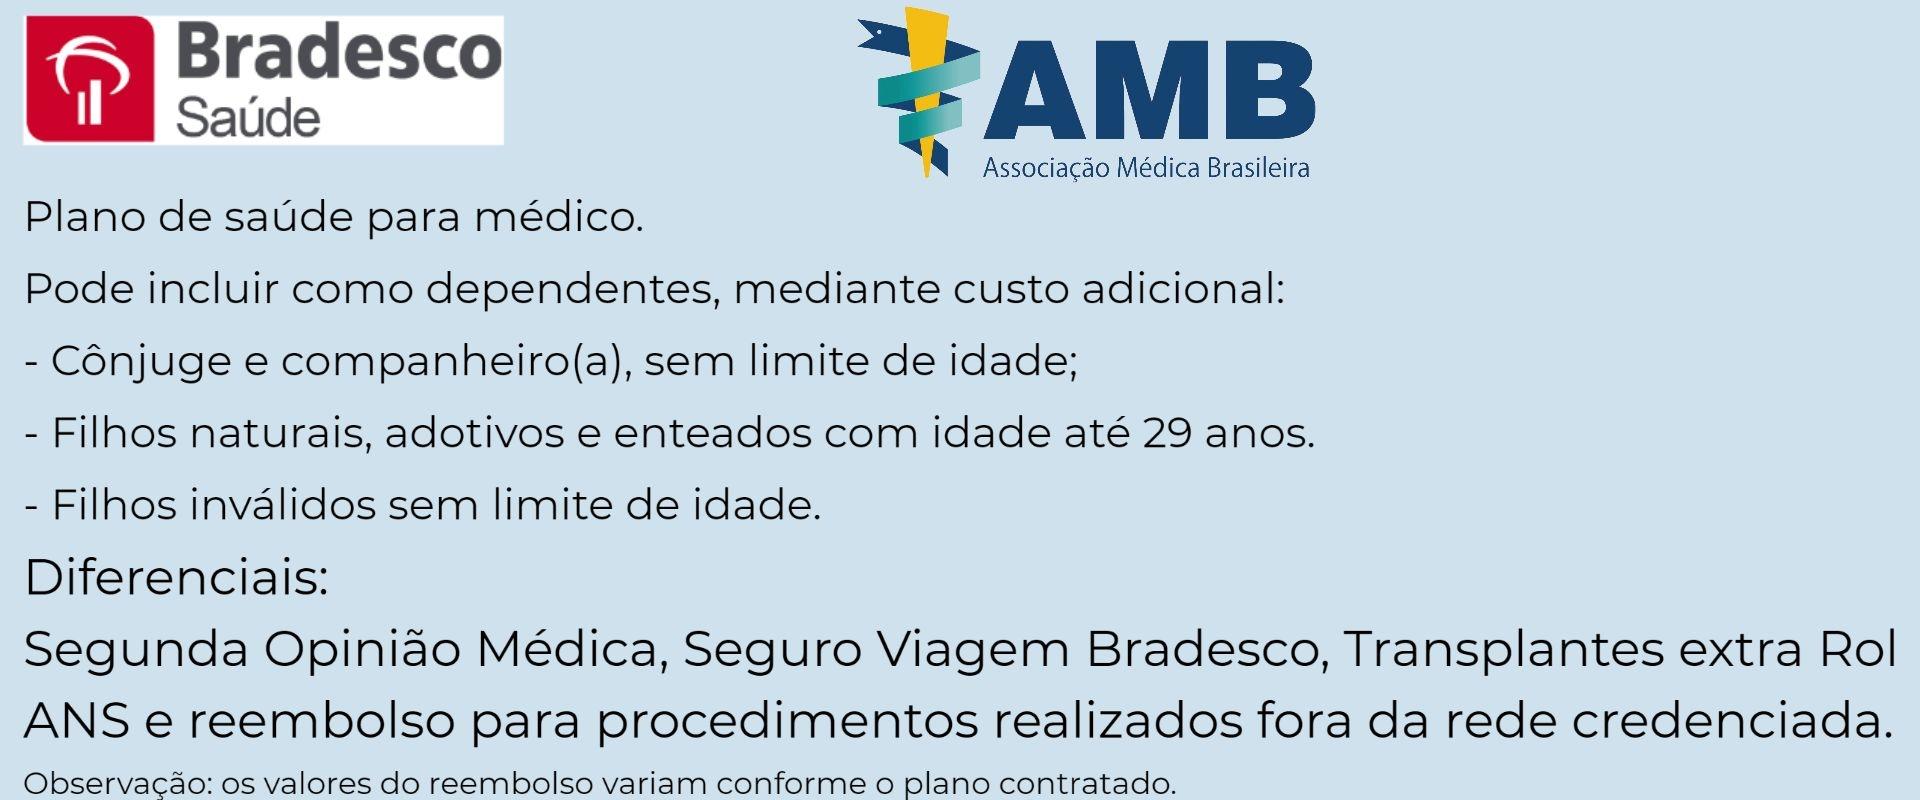 Bradesco Saúde AMB-AM